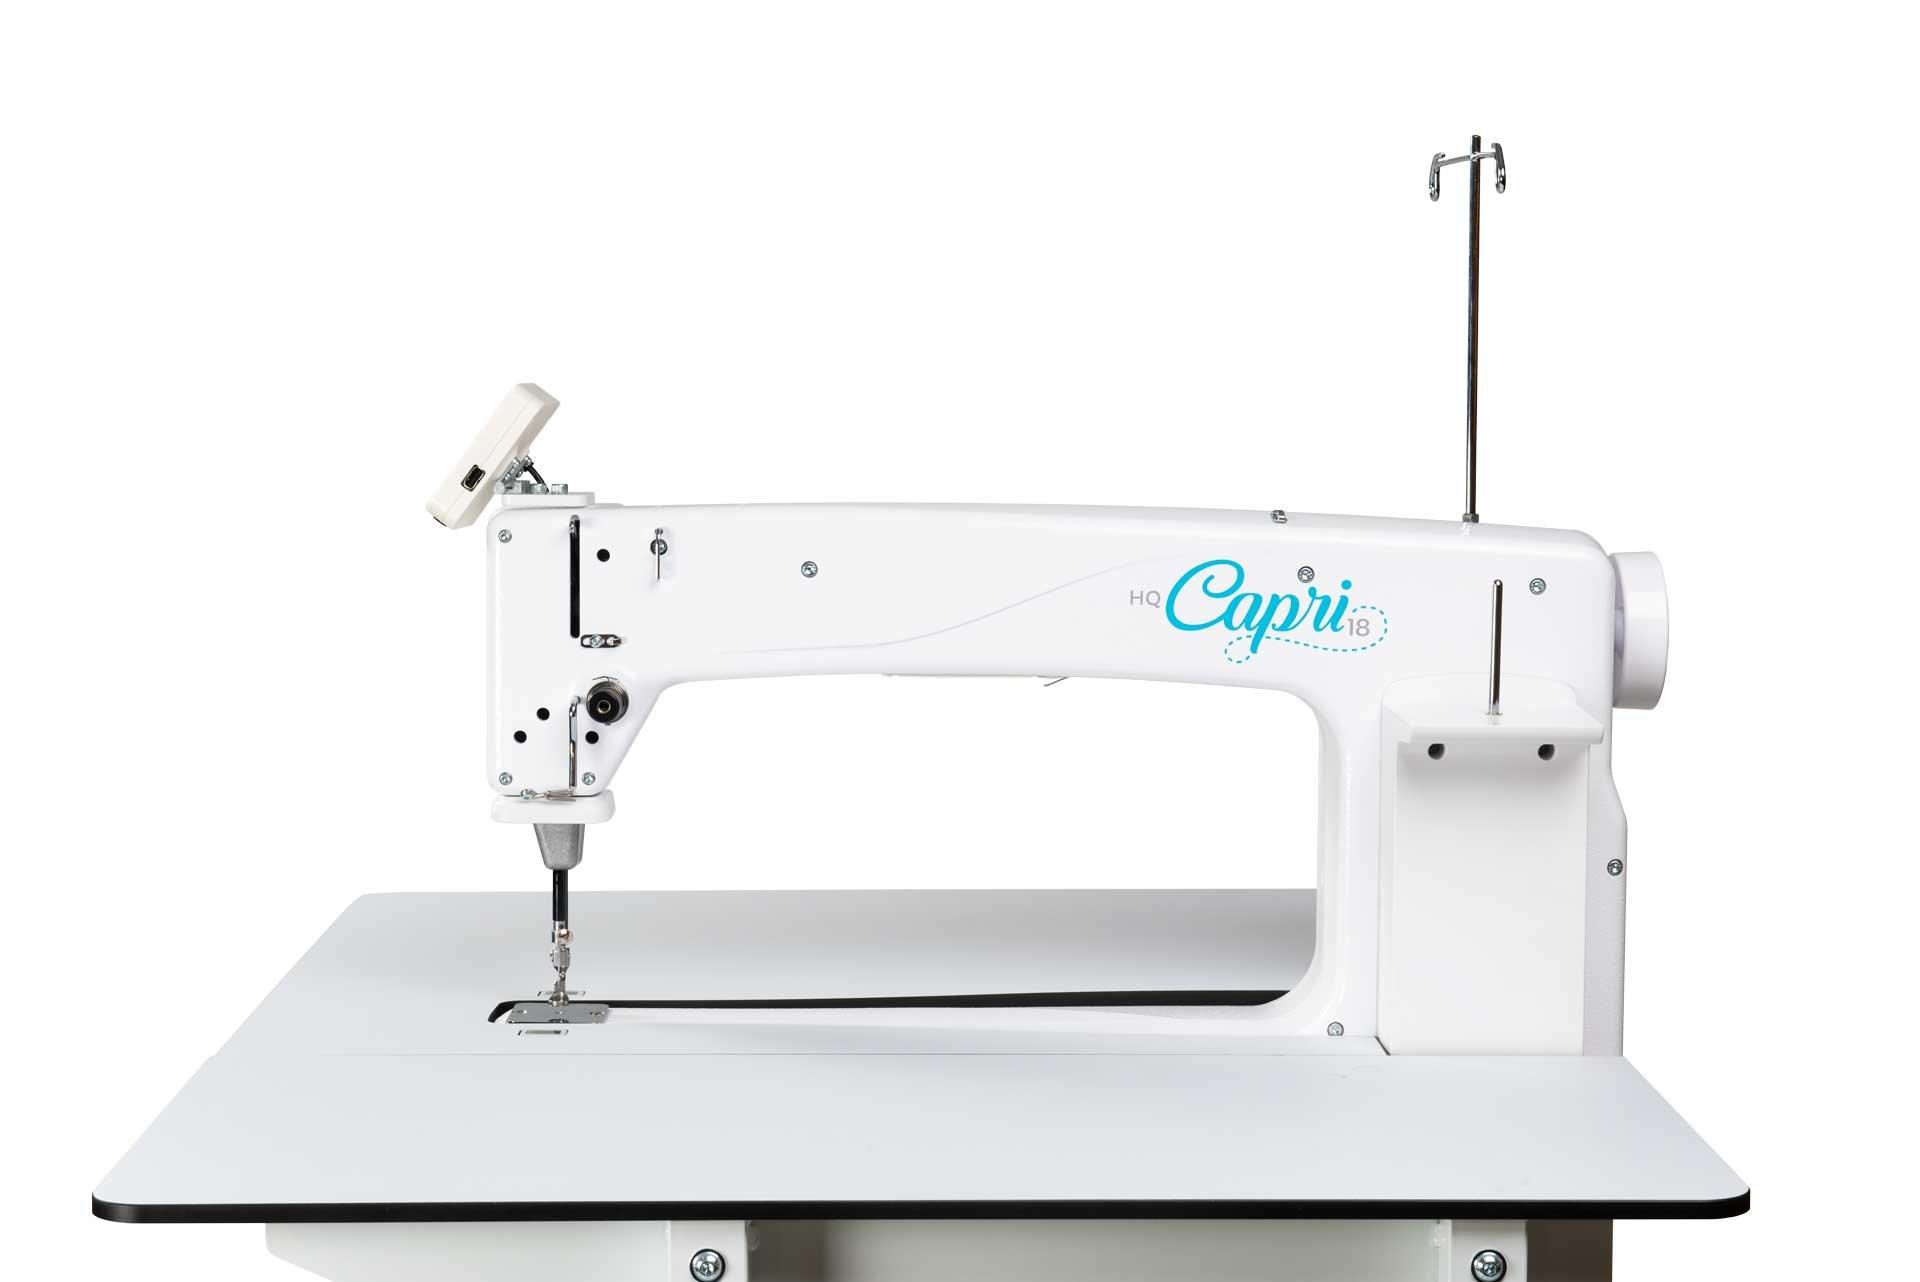 HQ Capri Stationary Longarm Quilting Machine with HQ InSight stitch regulation